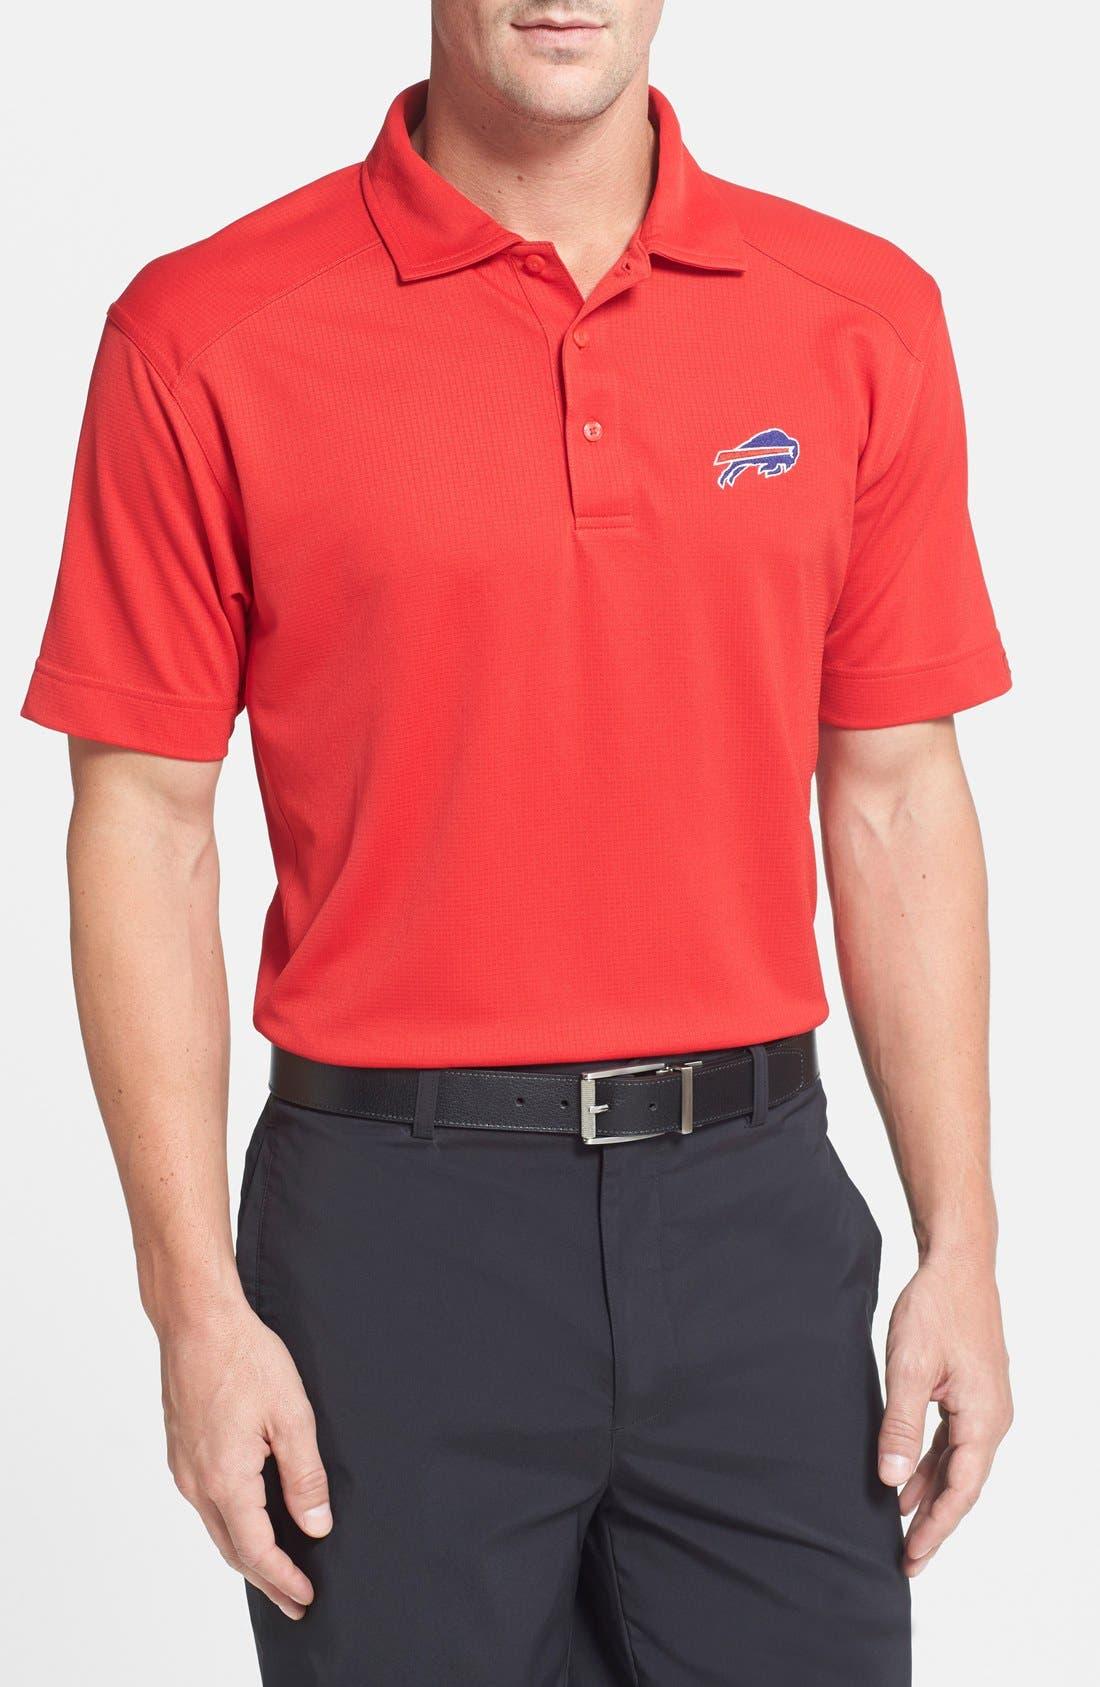 Buffalo Bills - Genre DryTec Moisture Wicking Polo,                         Main,                         color, Red